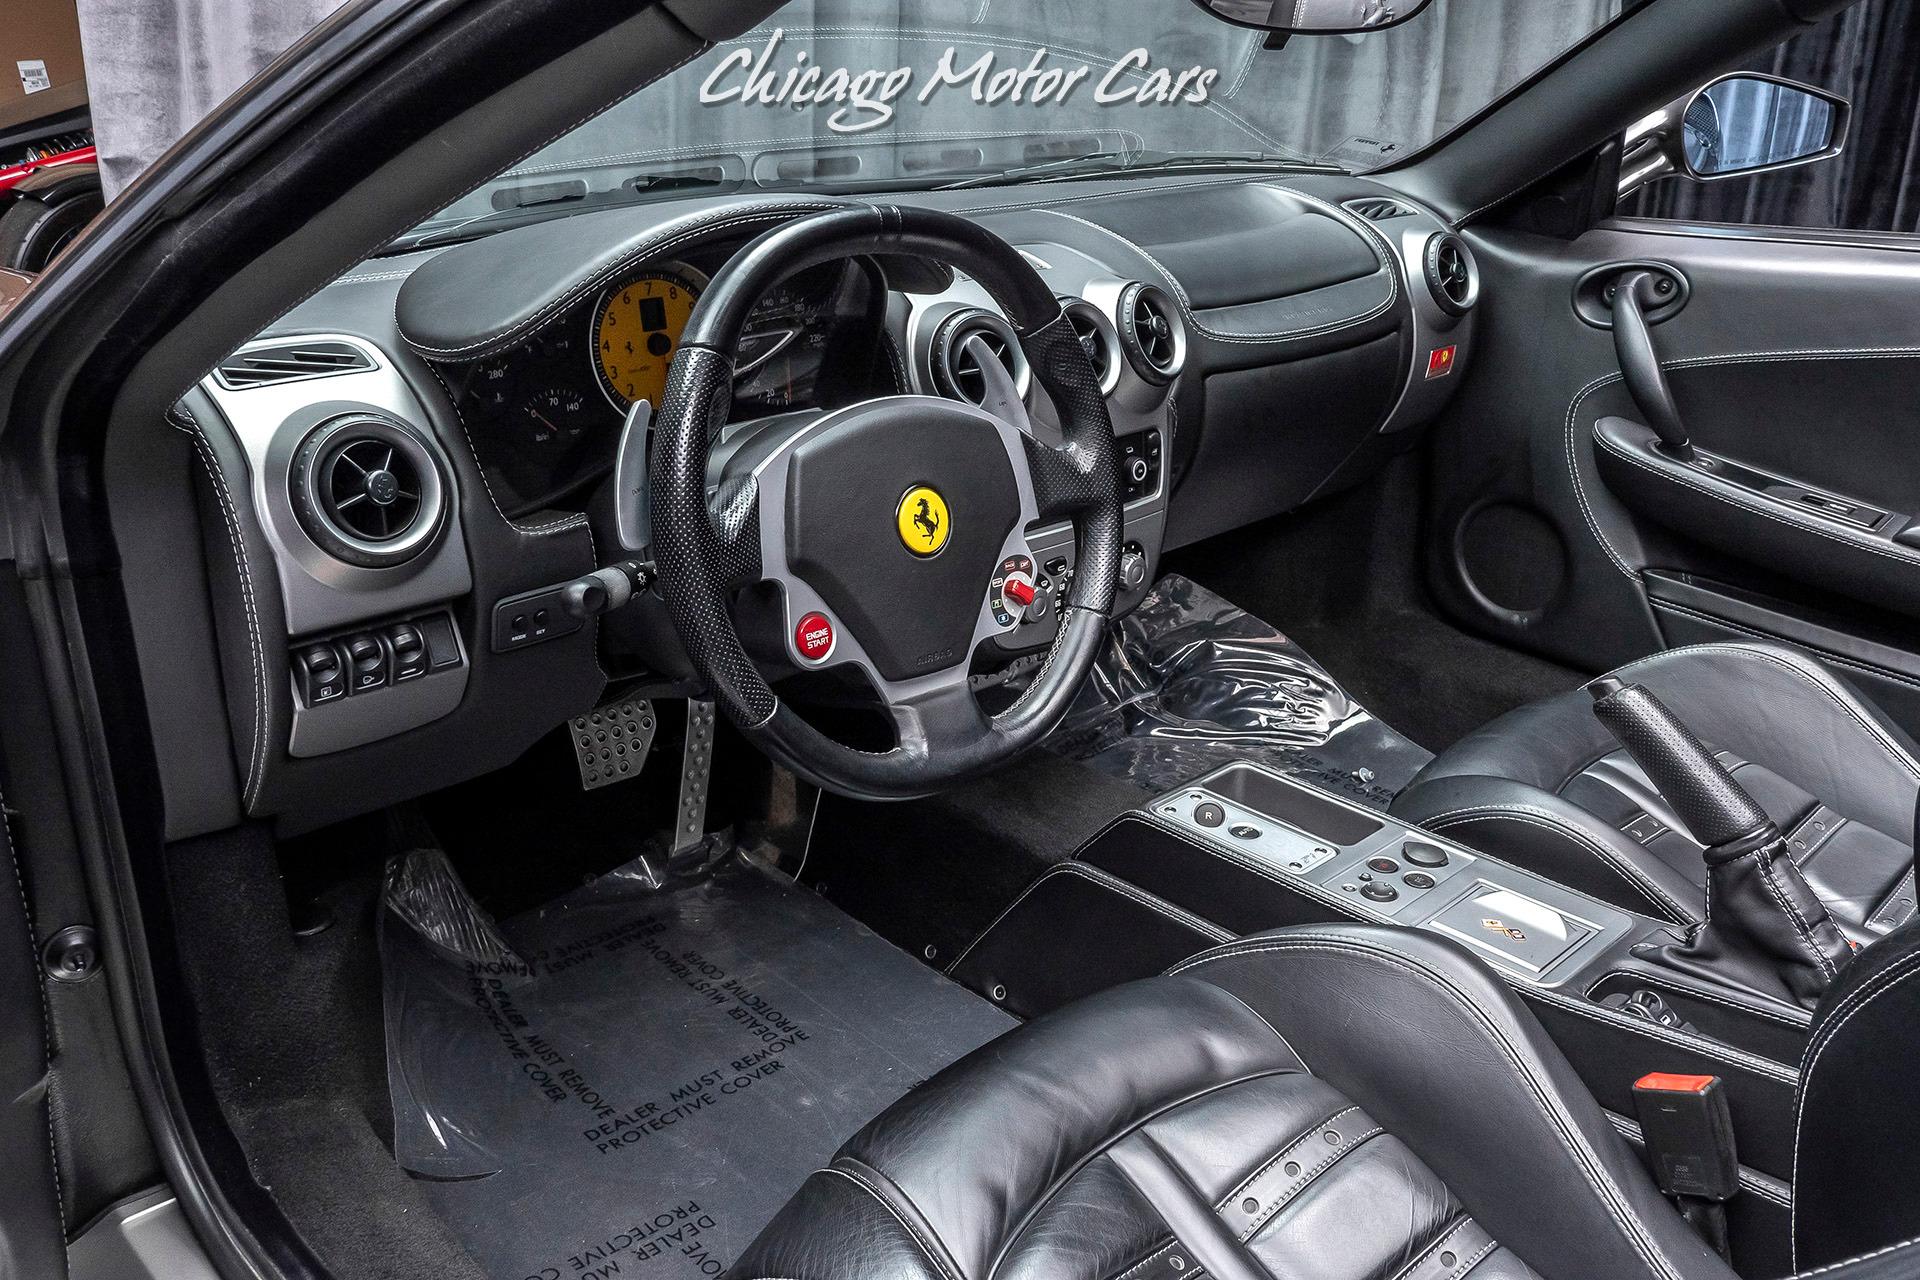 Used-2007-Ferrari-F430-F1-Spider-Only-12k-Miles-Daytona-Style-Seats-Fab-Speed-Exhaust